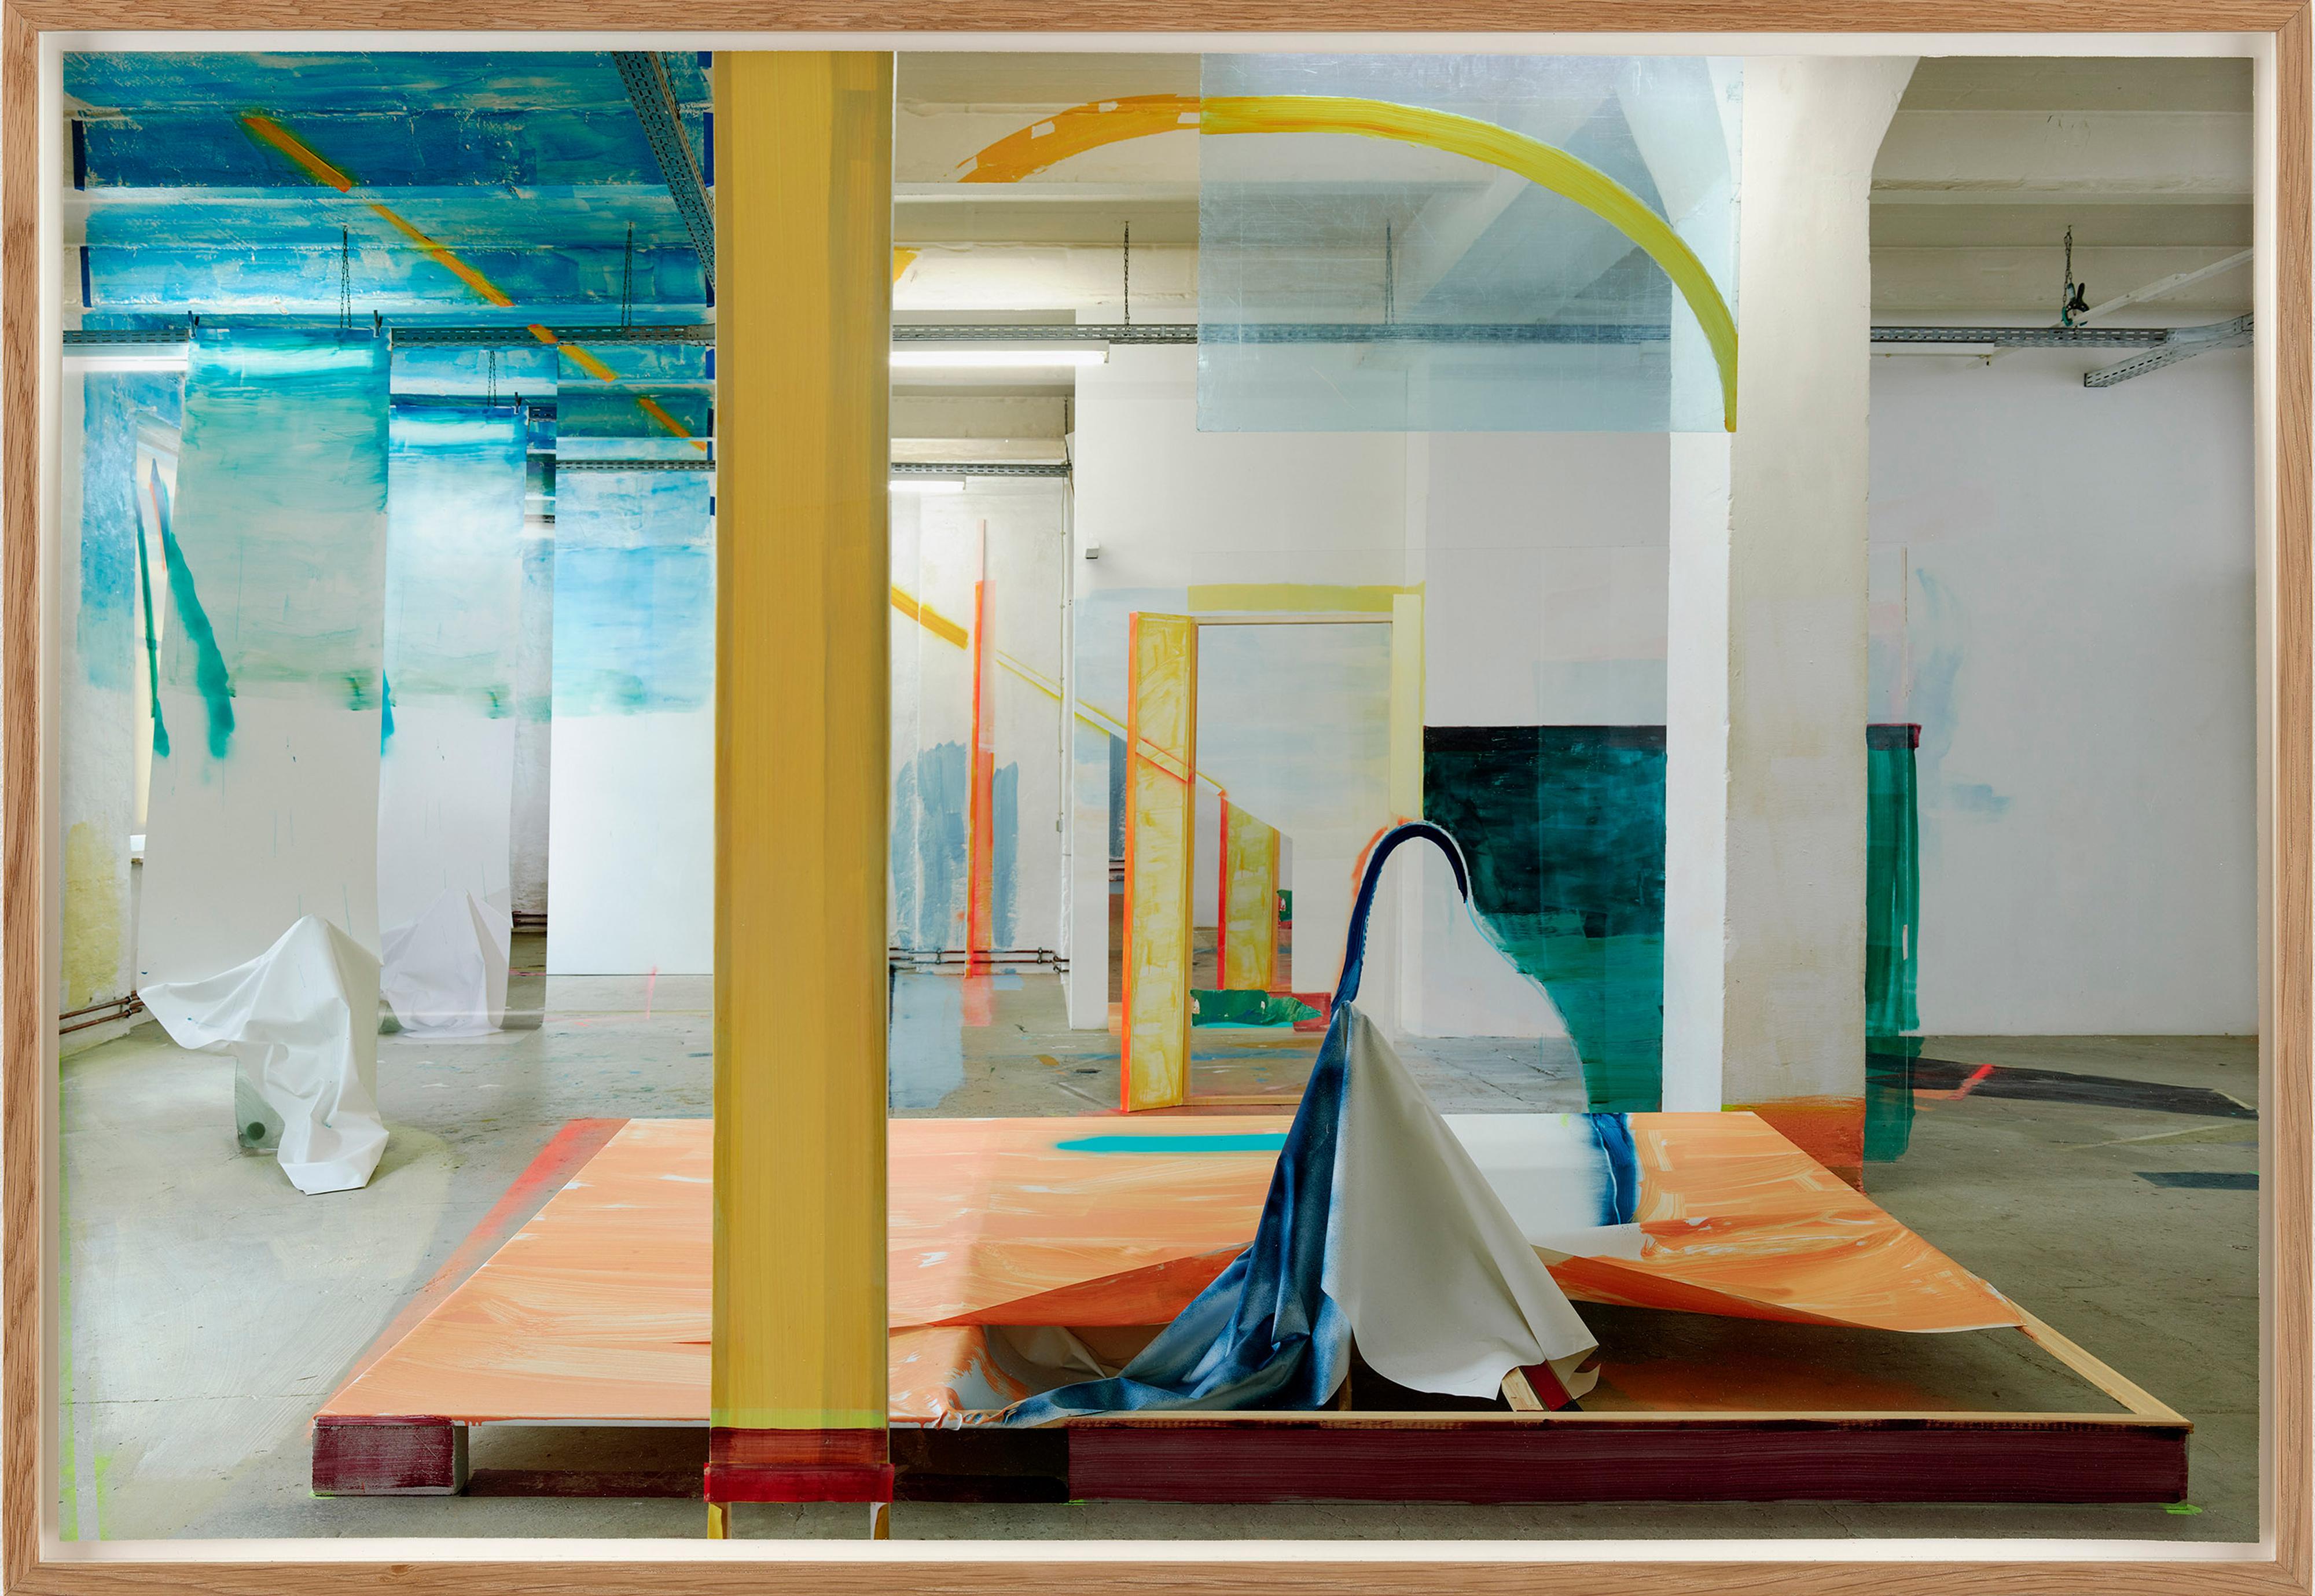 Galerie Barbara Thumm \ New Viewings #5 \ New Viewings #5